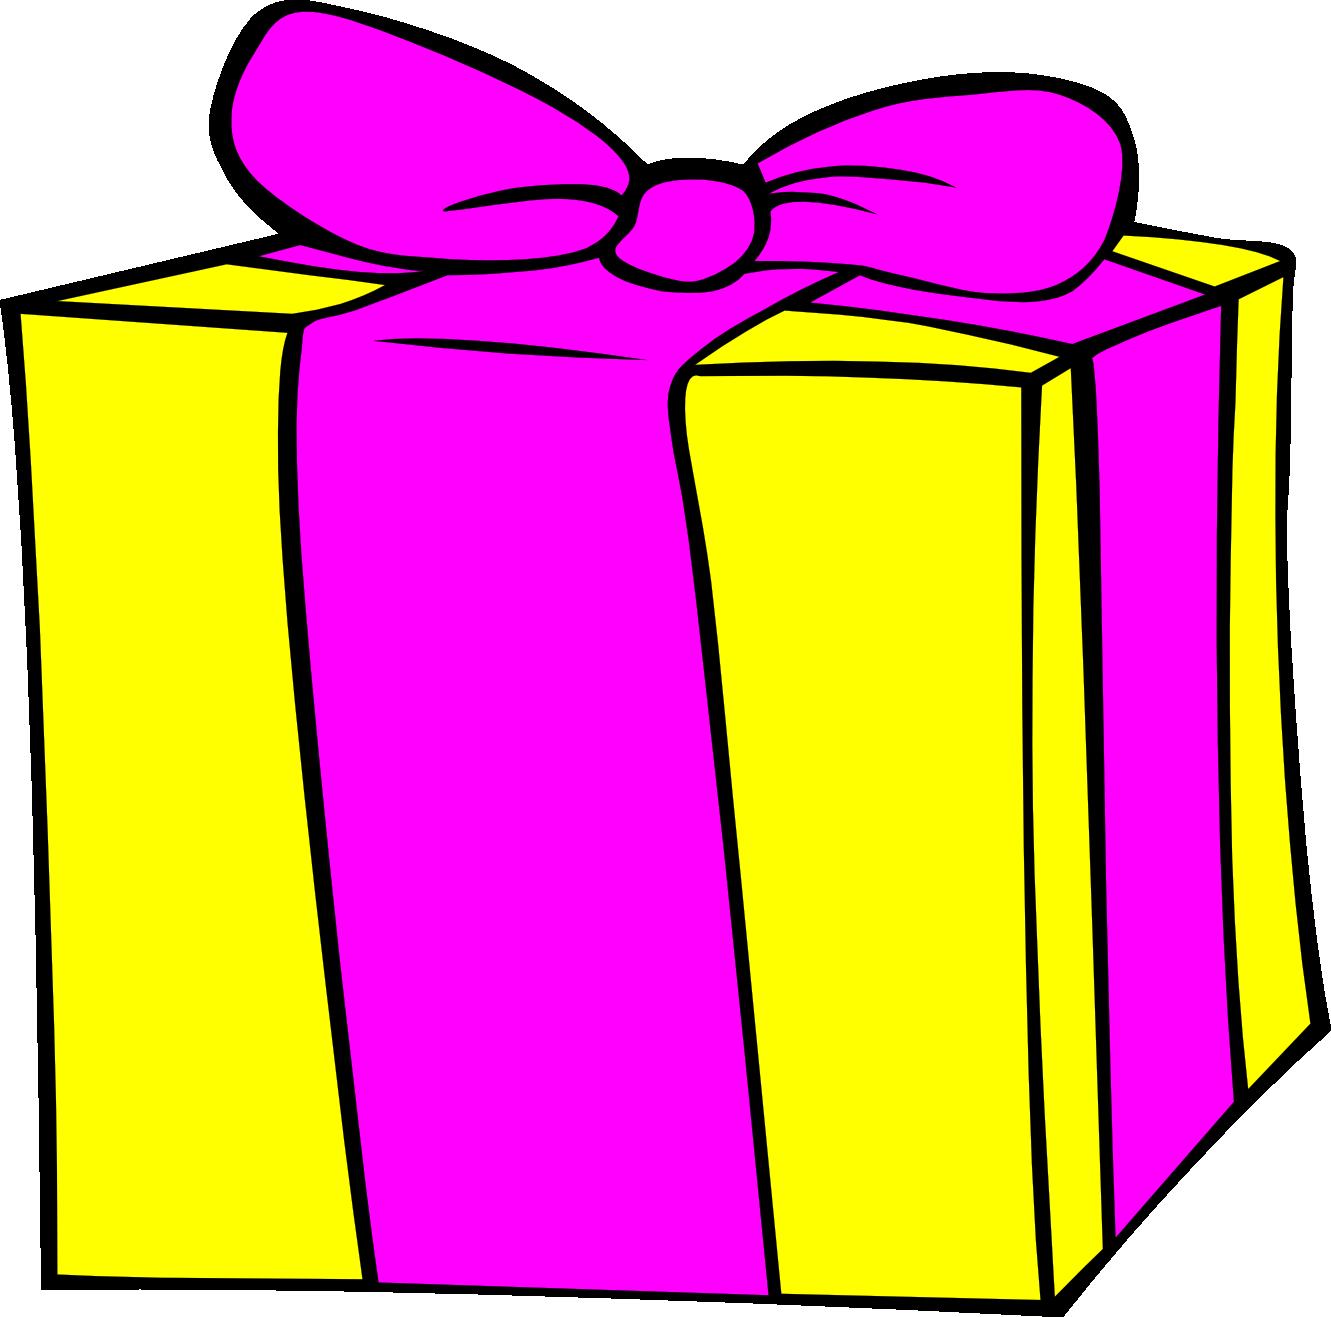 Clip art panda free. Gifts clipart birthday present